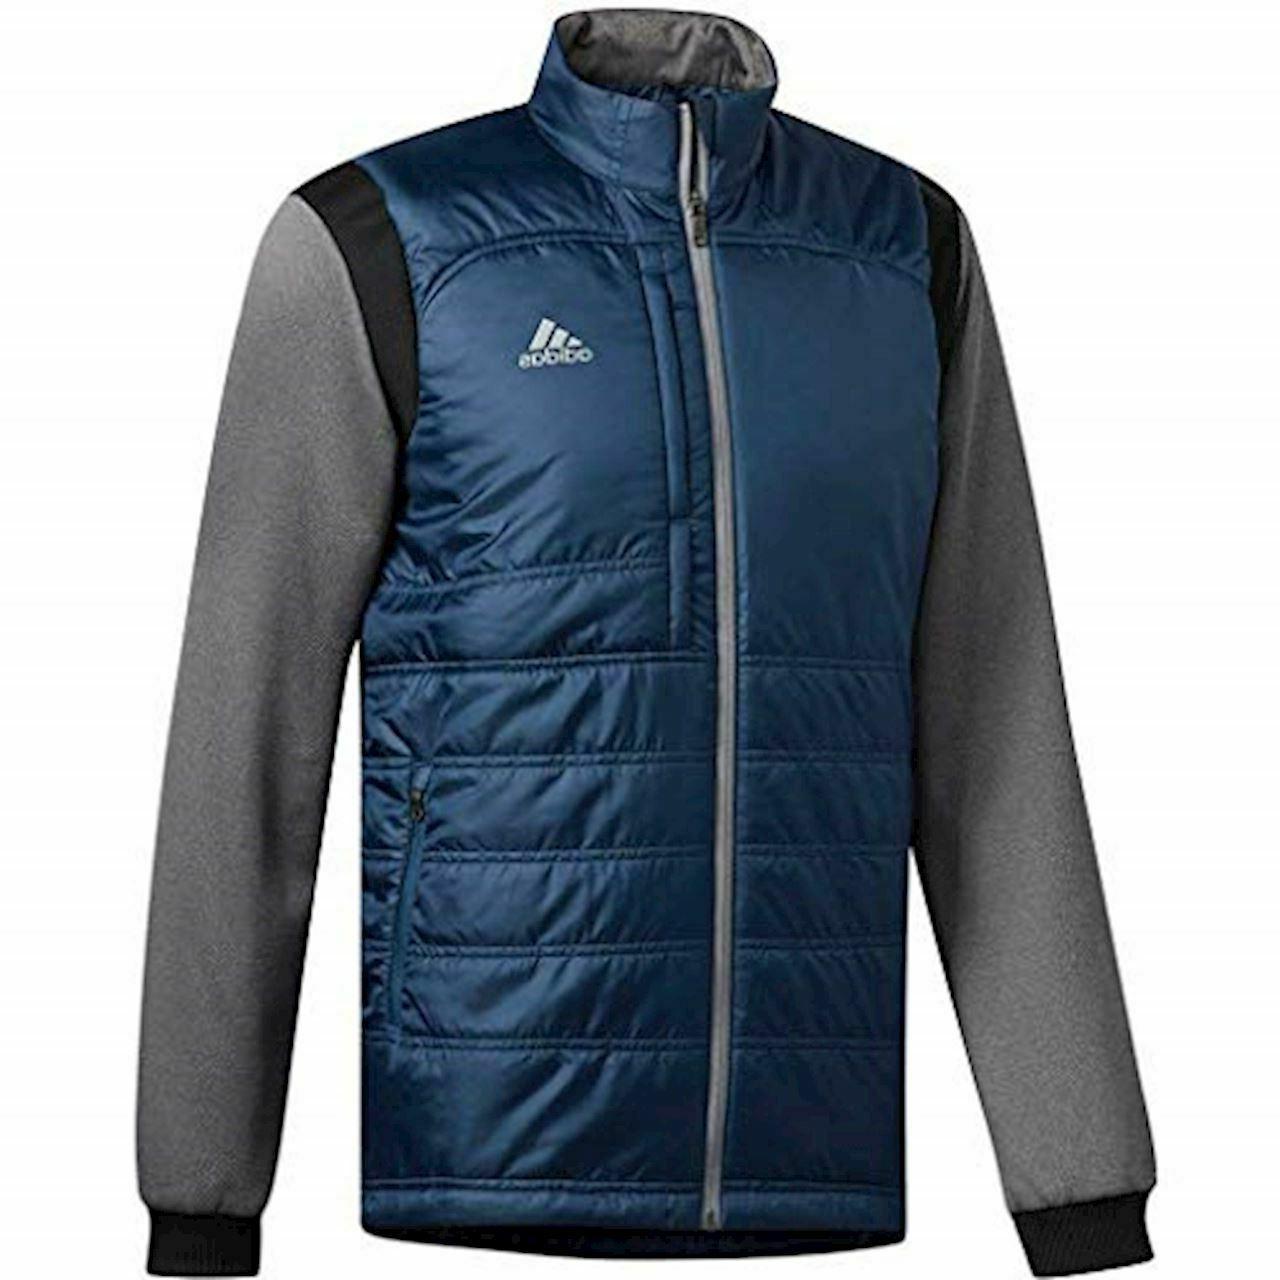 Men Frostguard $180